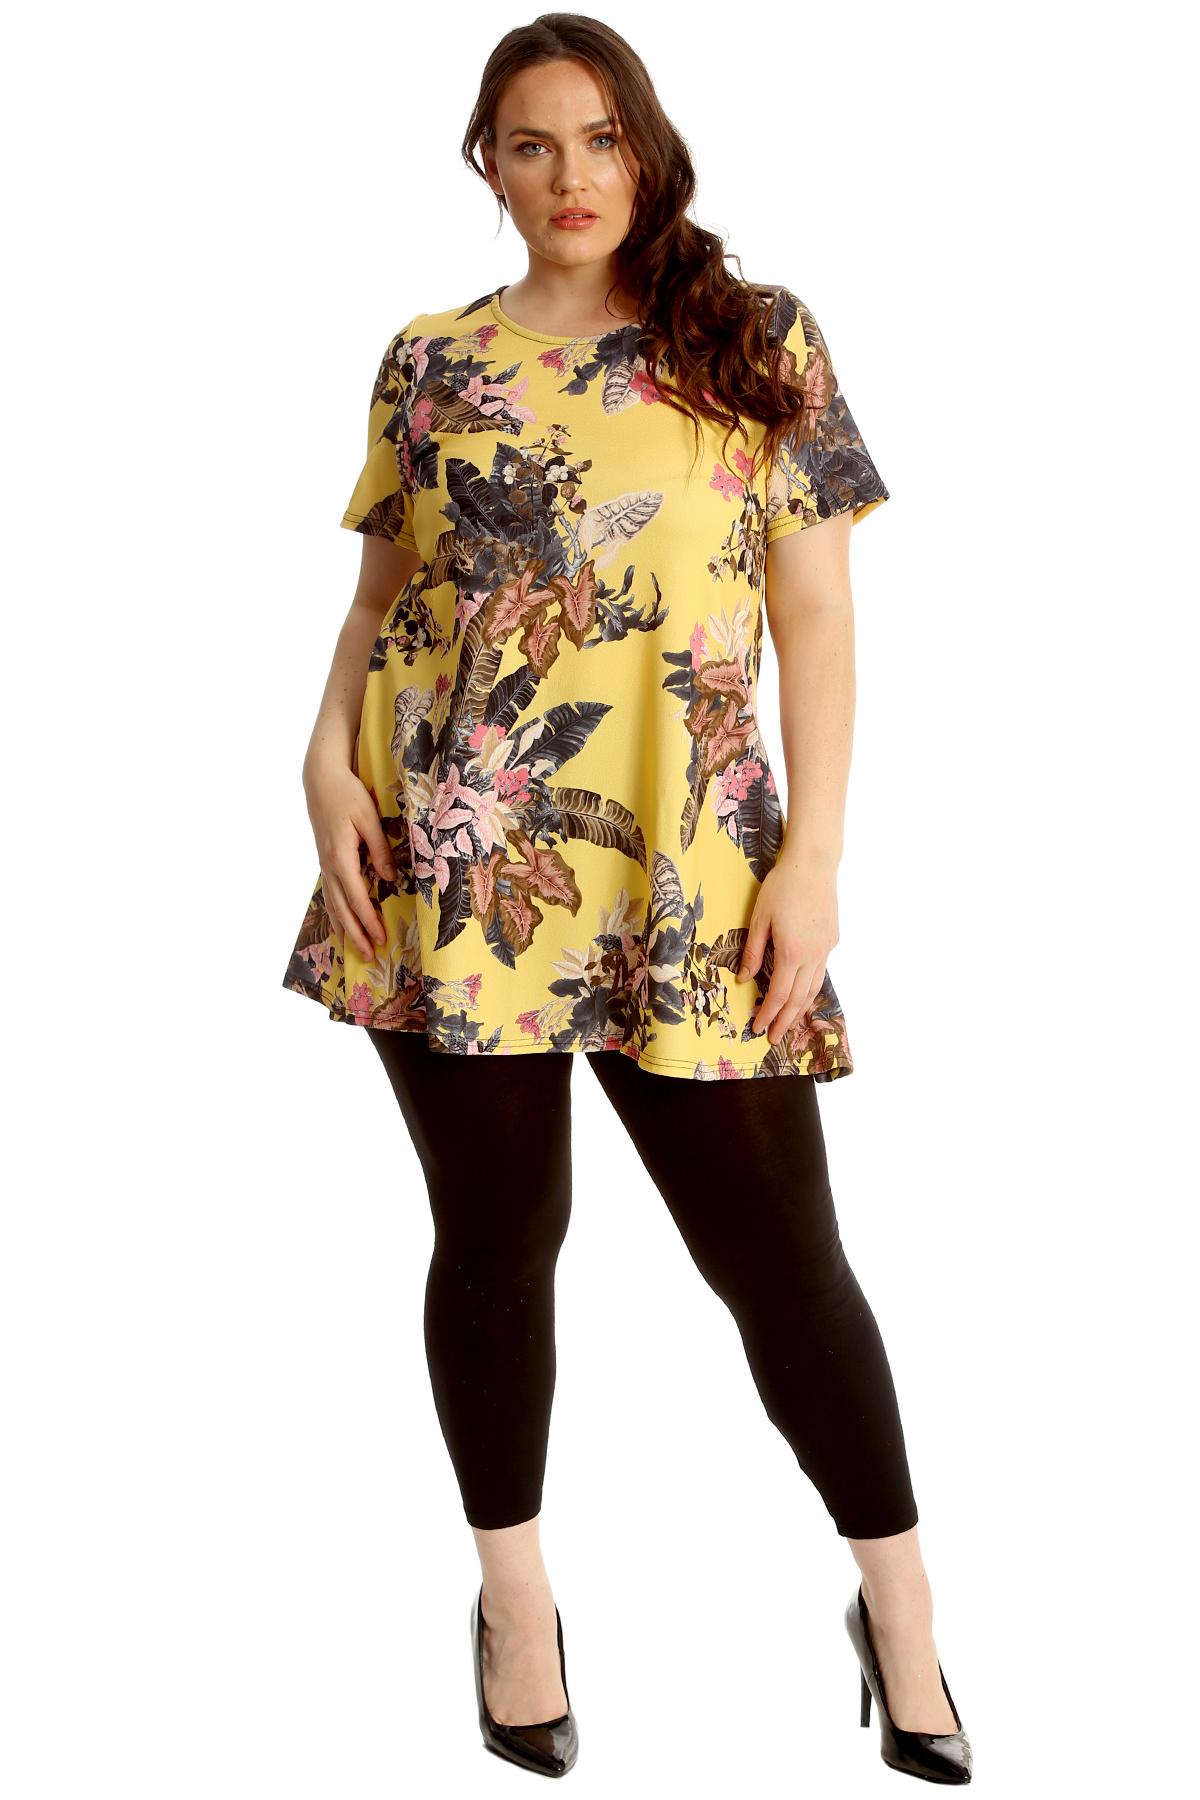 New Ladies Women Plain Short Sleeves Swing Tunic Top Plus Sizes 14-24